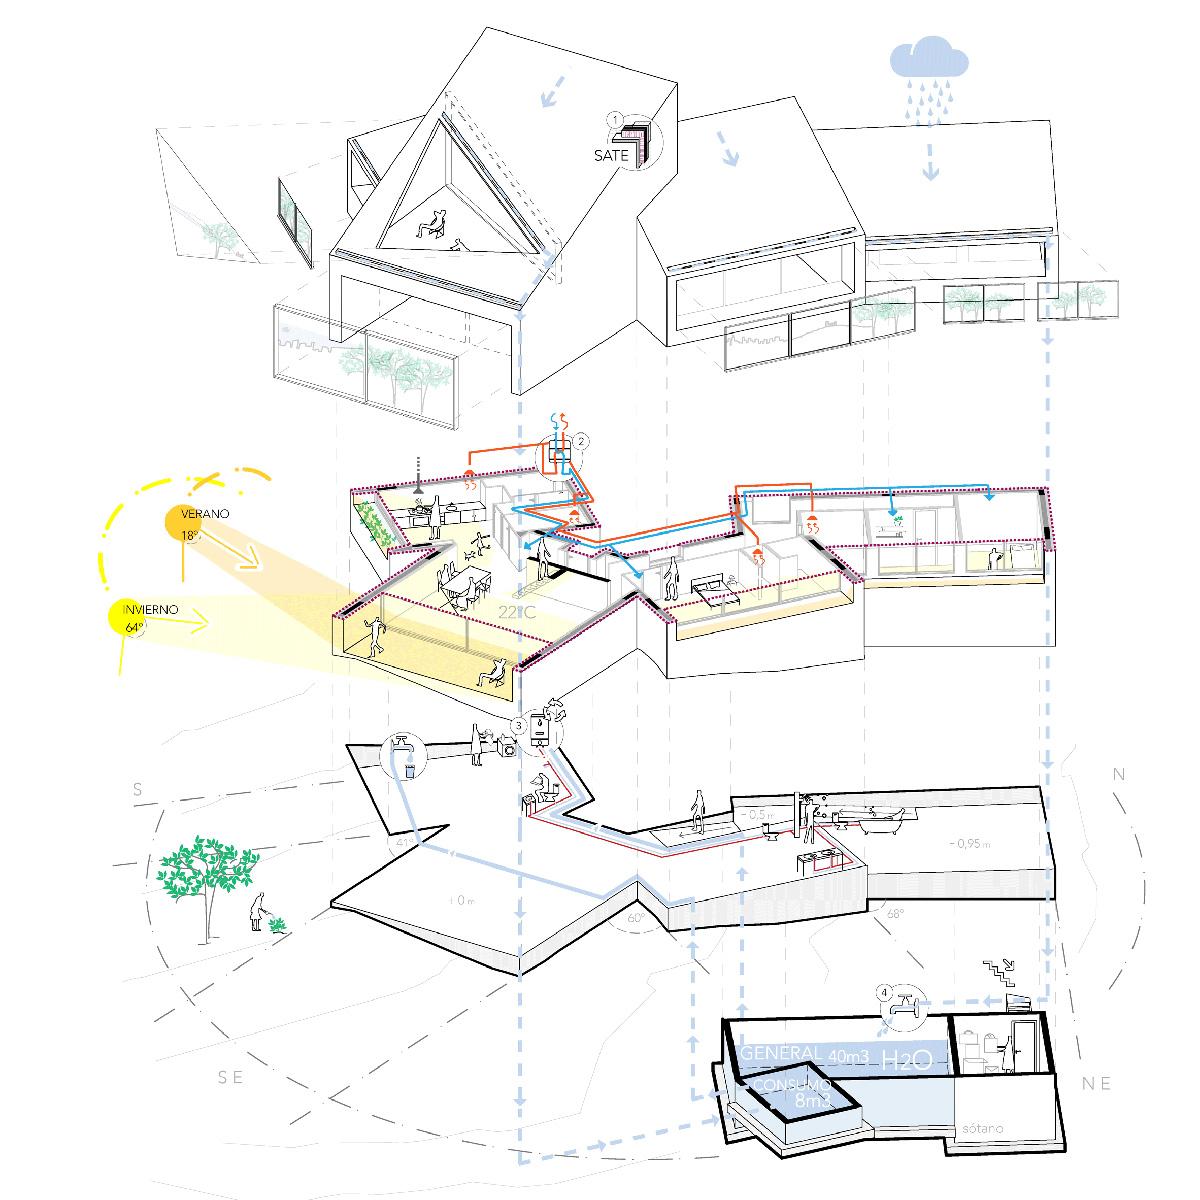 15-casa-mm-ohlab-oliver-hernaiz-architecture-lab-foto-jose-hevia